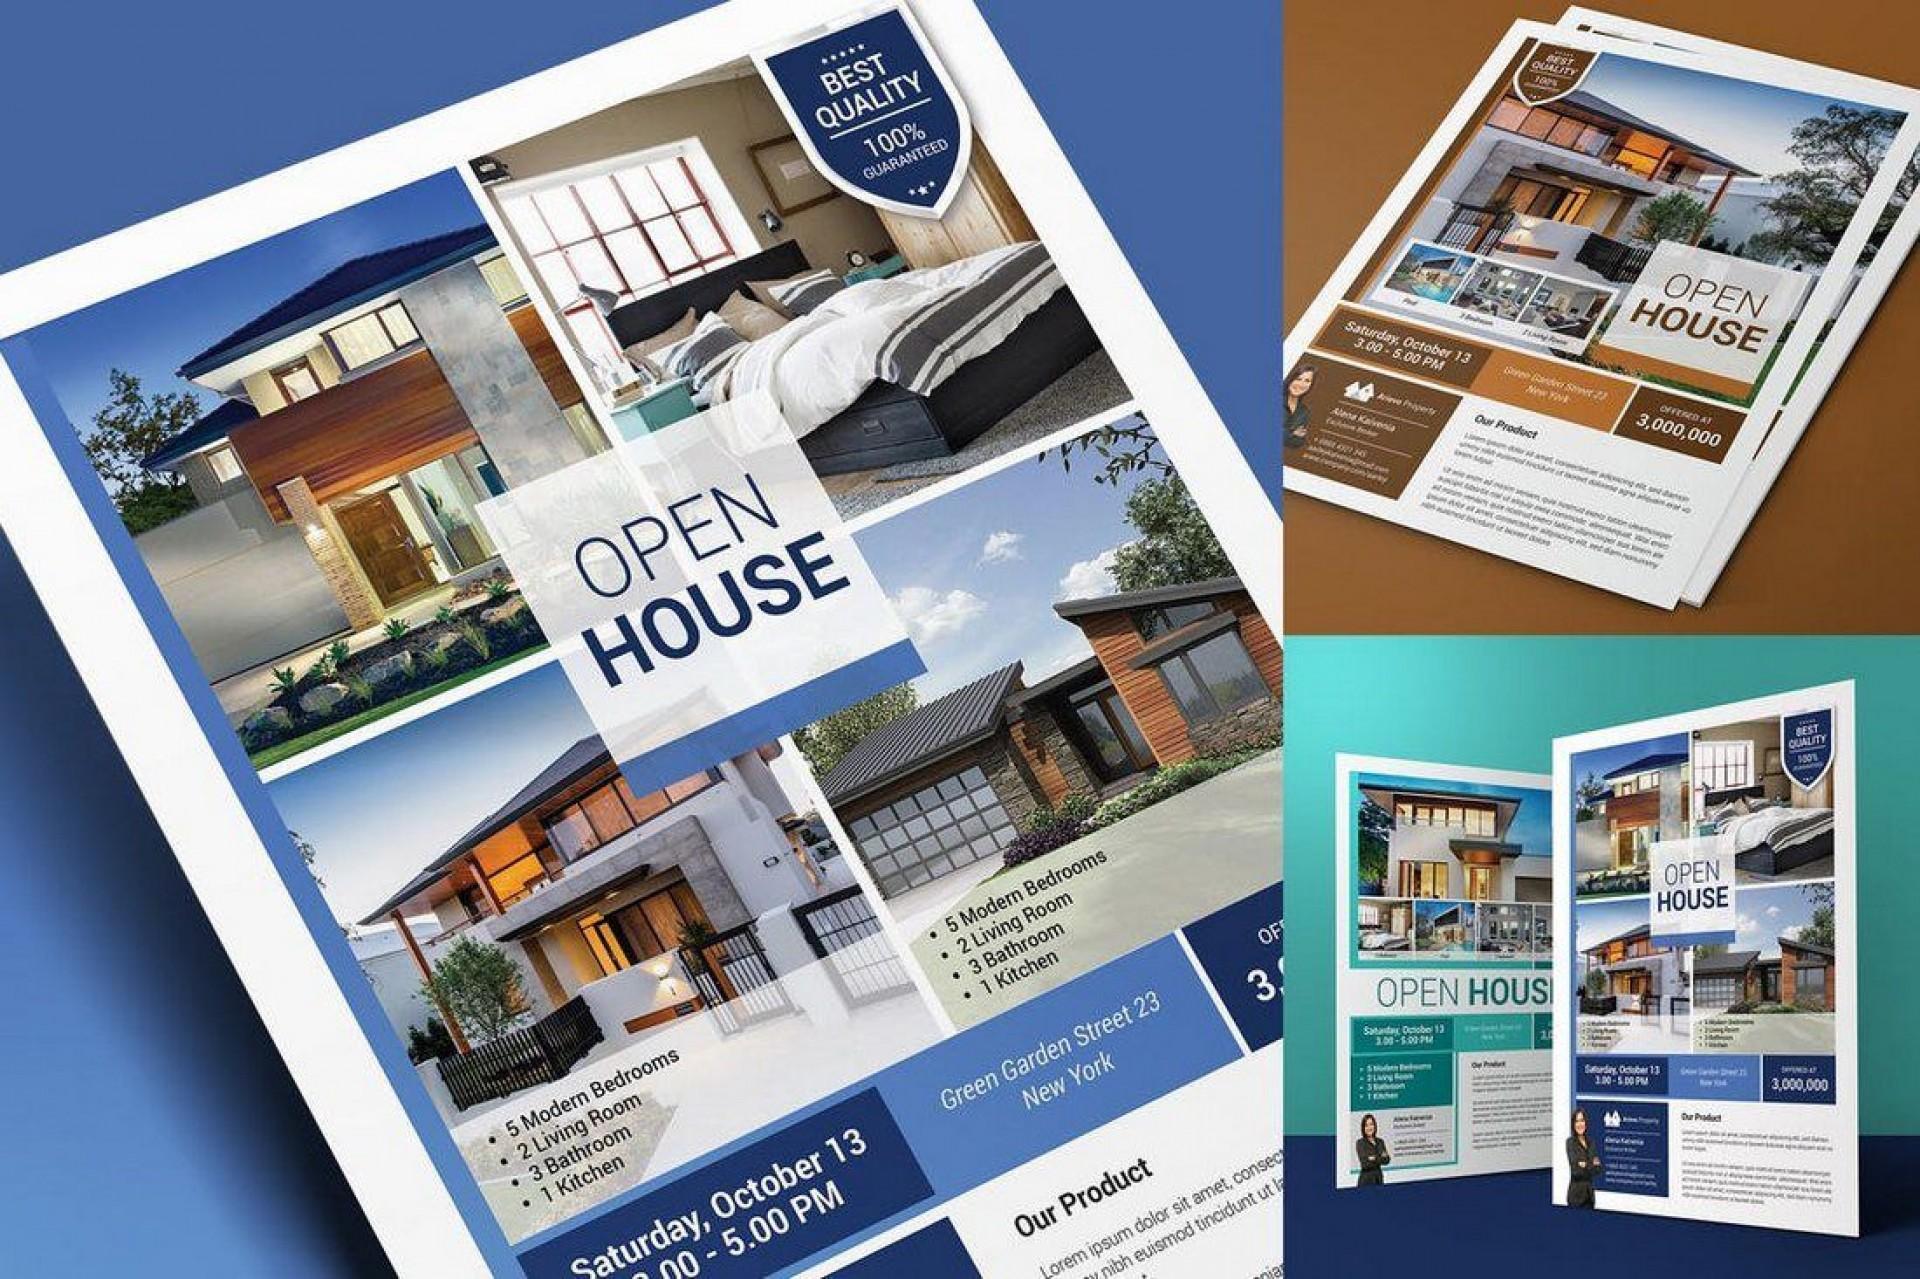 008 Sensational Free Open House Flyer Template Inspiration  Microsoft Word1920